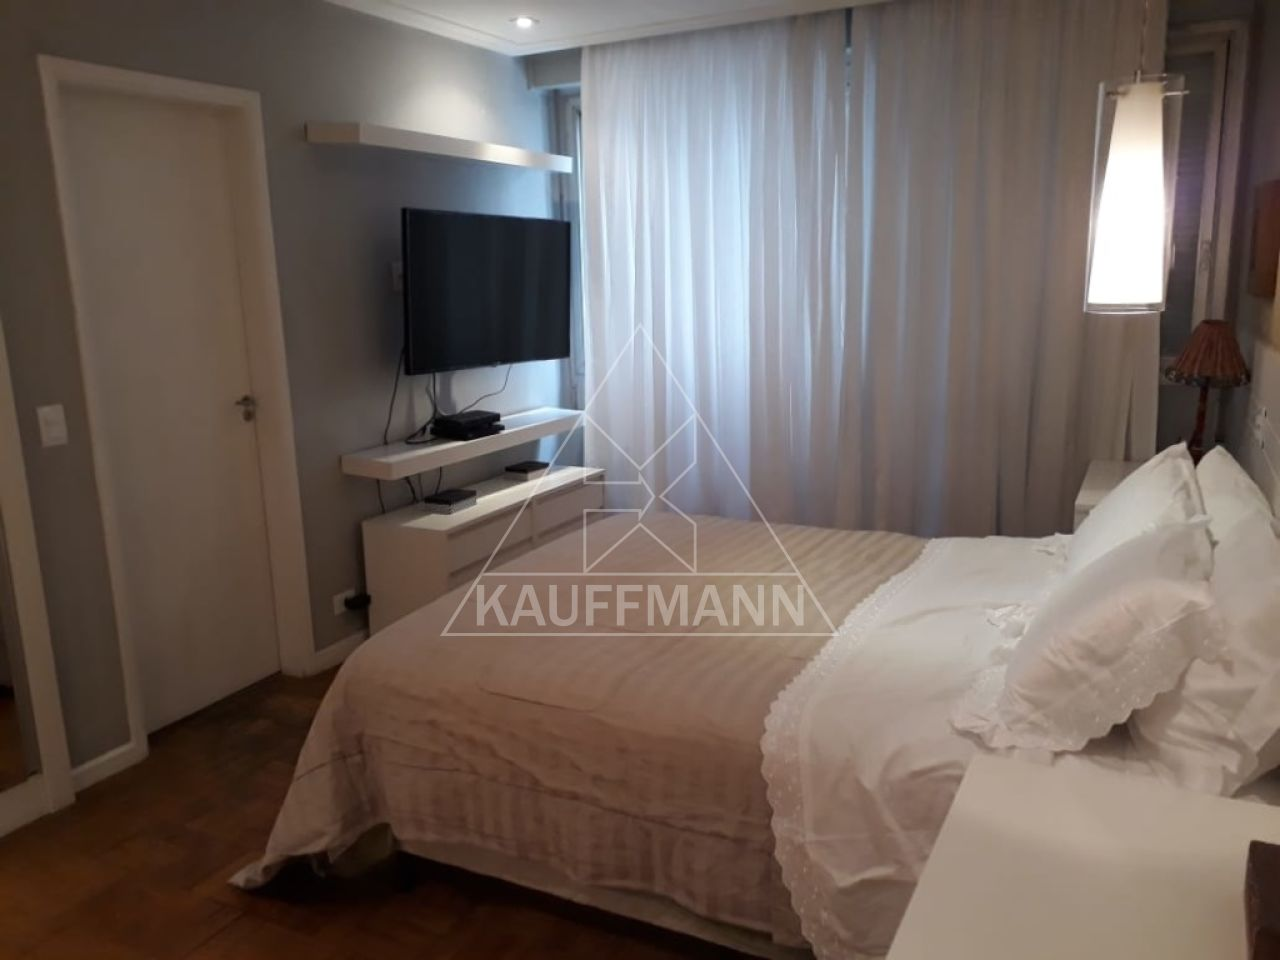 apartamento-venda-sao-paulo-jardim-paulista-3dormitorios-3suites-1vaga-174m2-Foto30